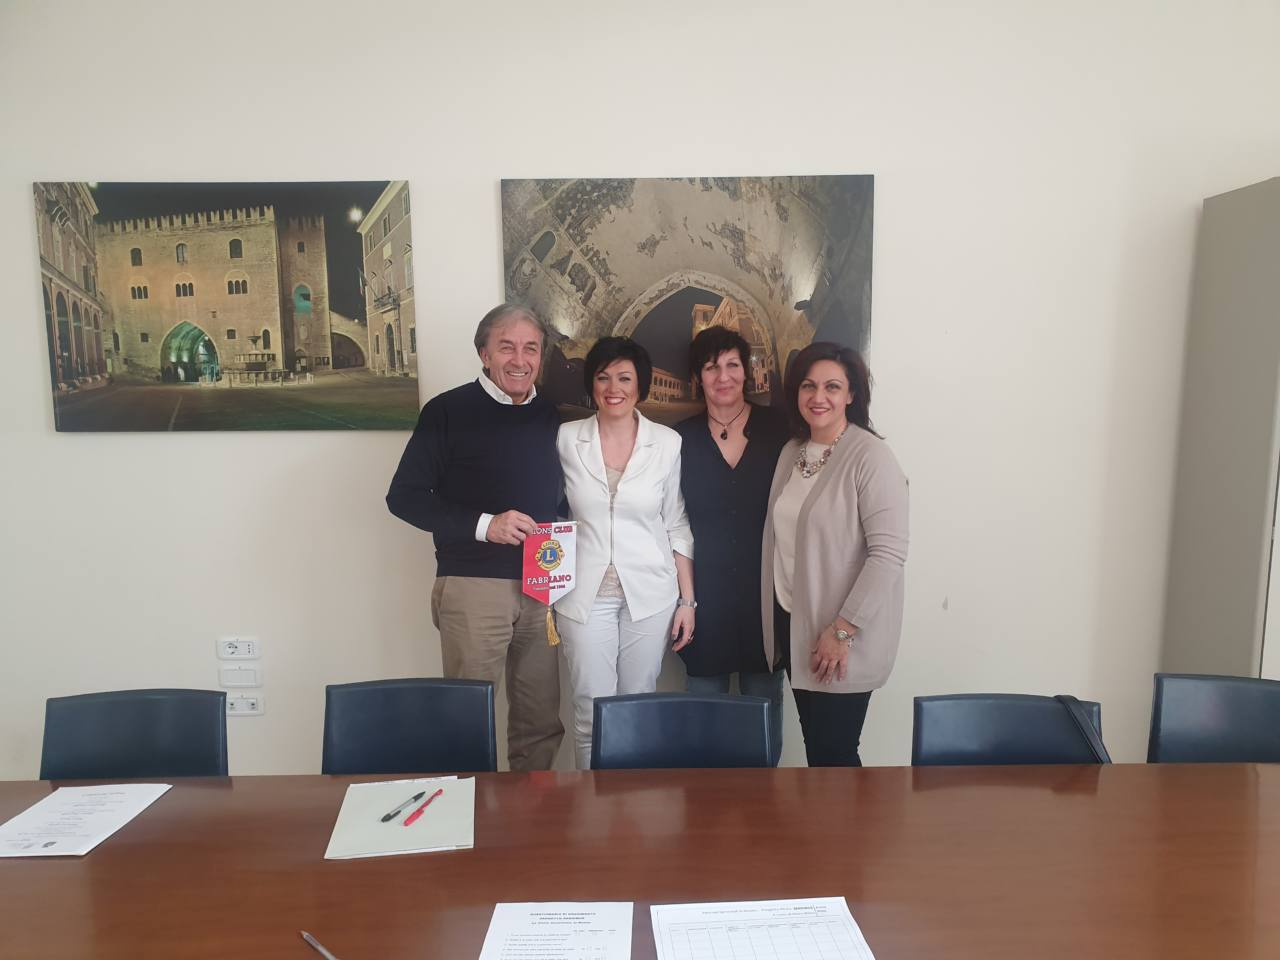 Alaimo Angelelli, Mara Brera, Simona Lupini e Roberta Cristalli foto